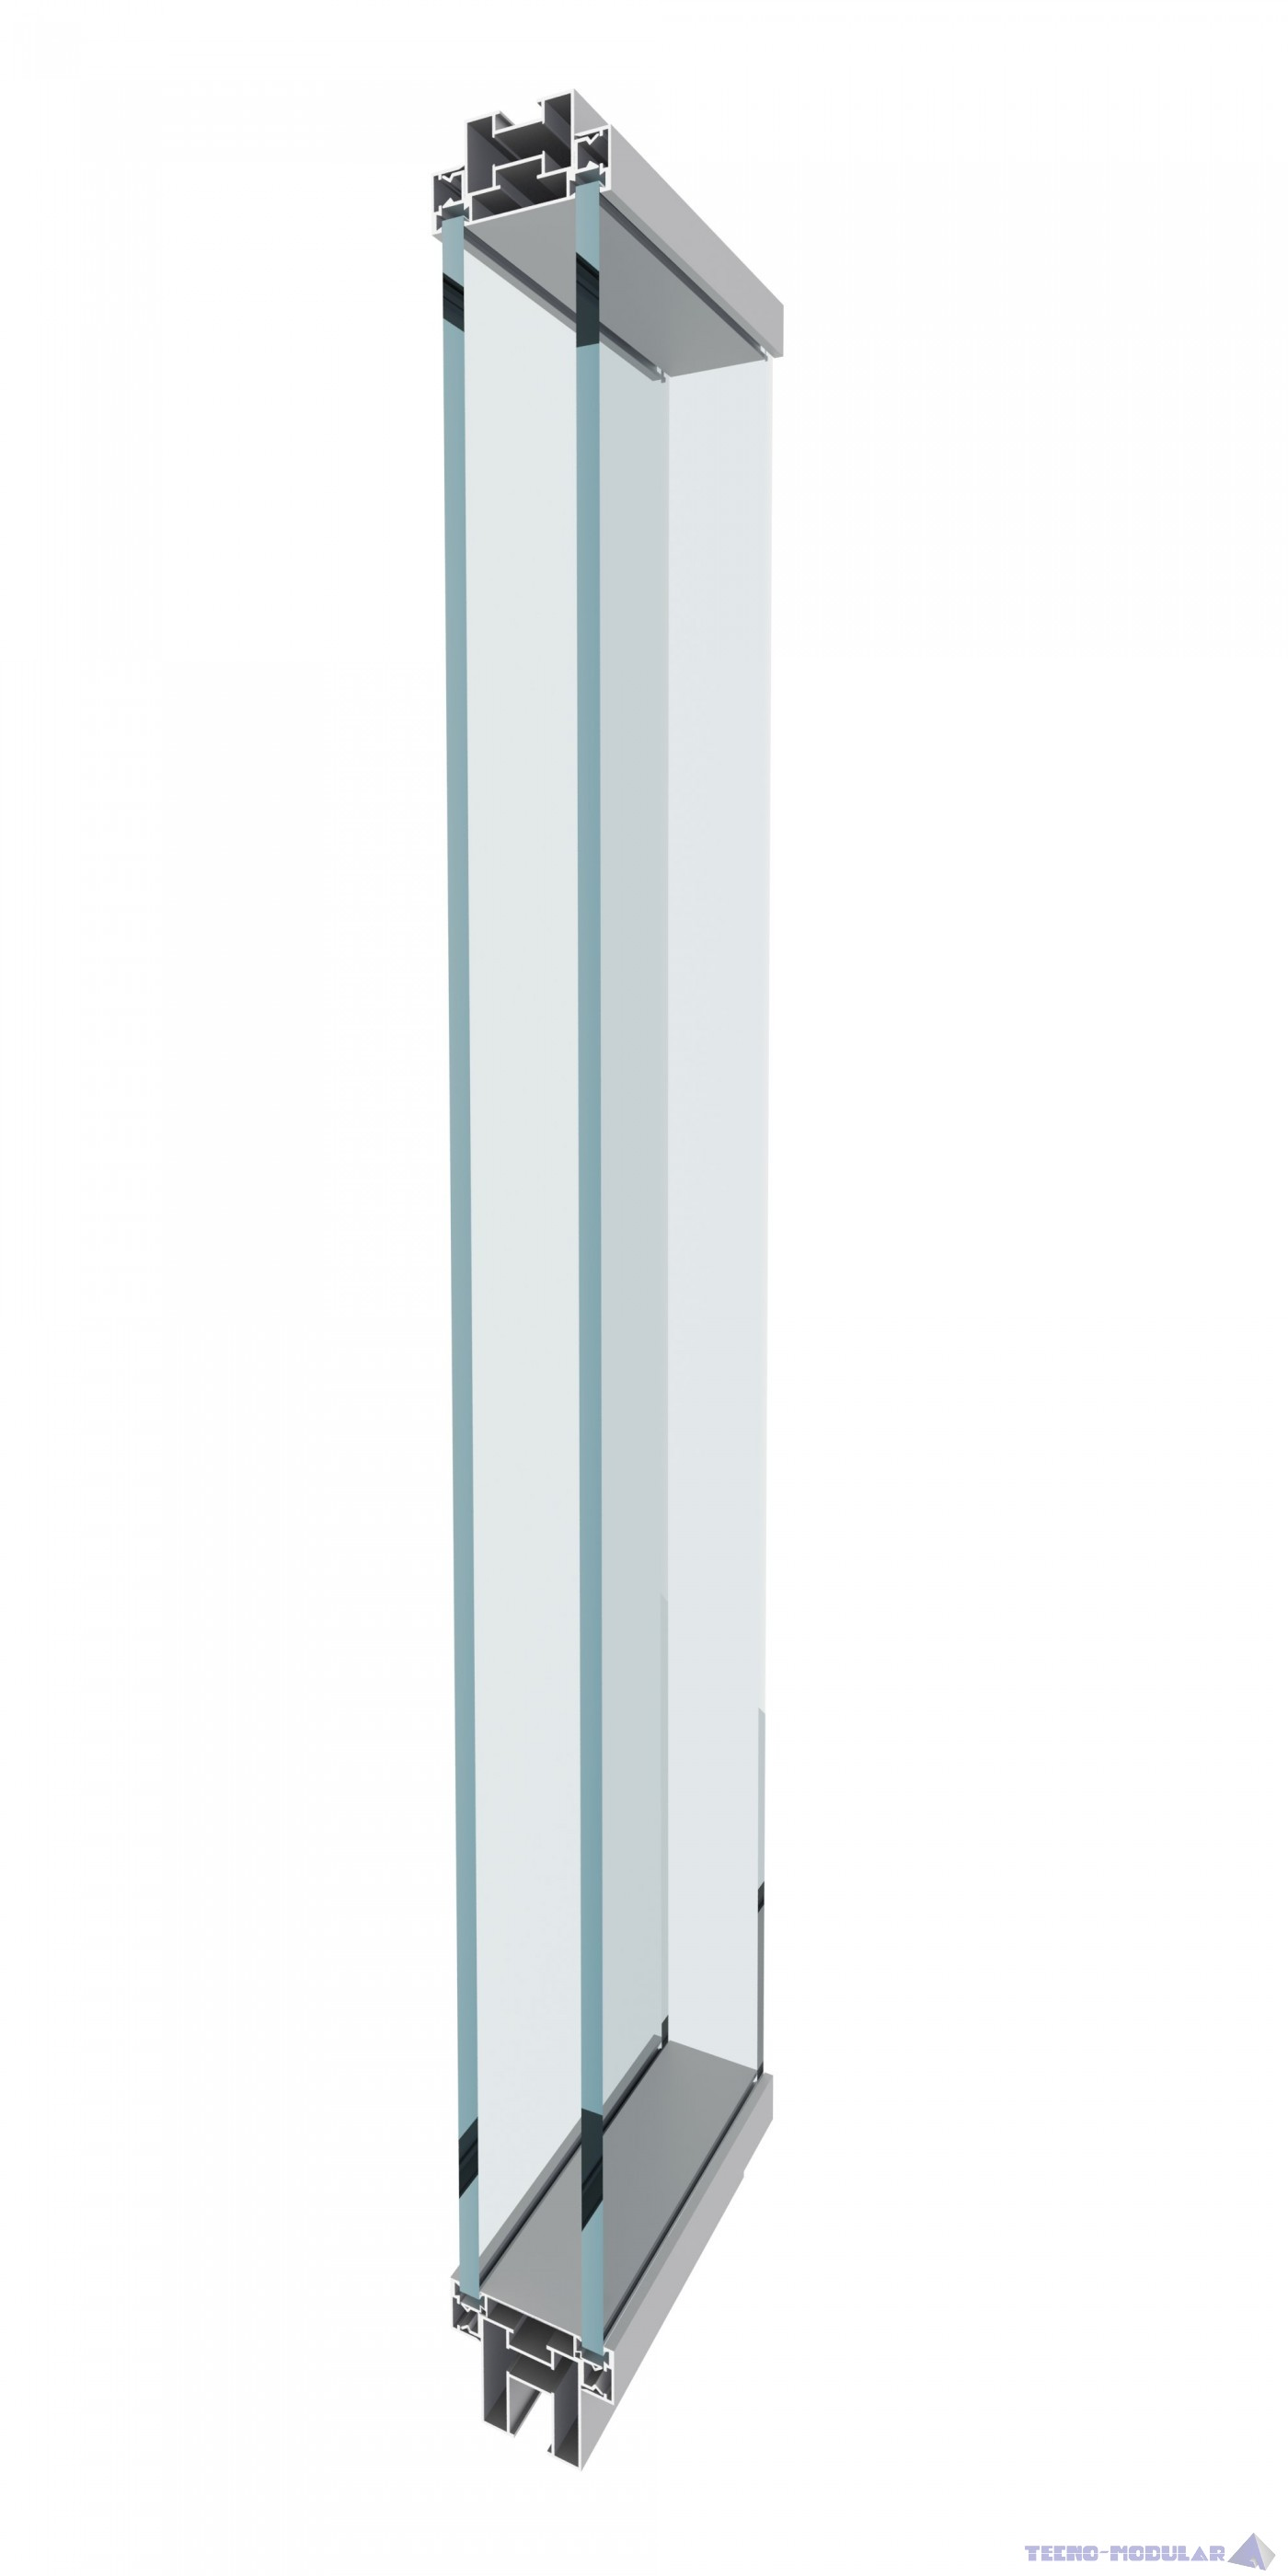 Mamparas de oficinas AST-1 Vidrio contínuo laminar o templado de suelo a techo